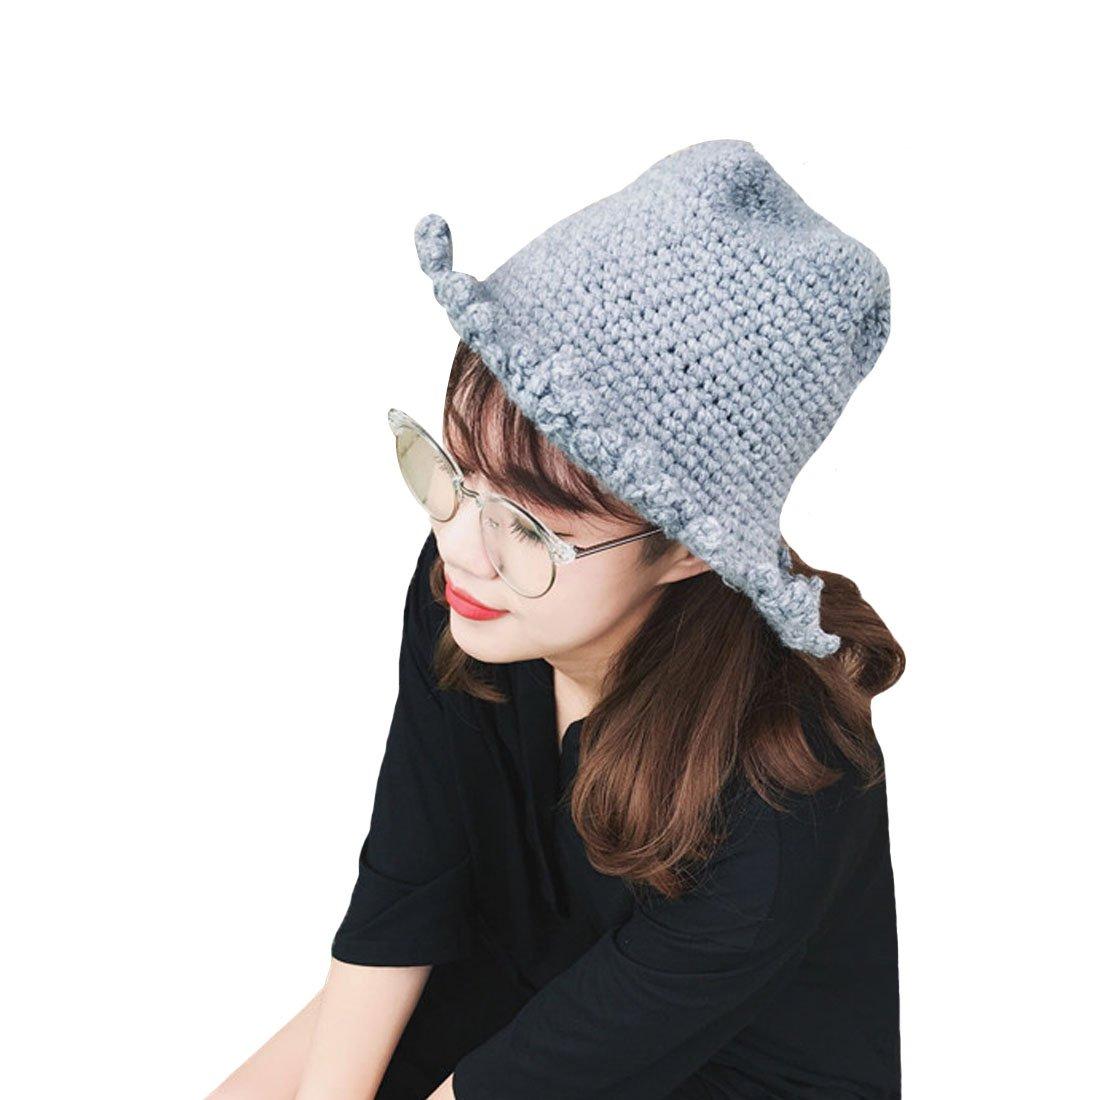 478a66624cf Gray Knit Wool Cap Girl Hat Autumn Winter Thicken Warm Fisherman Hat Cap  Bucket Hat Outdoor Caps at Amazon Women s Clothing store